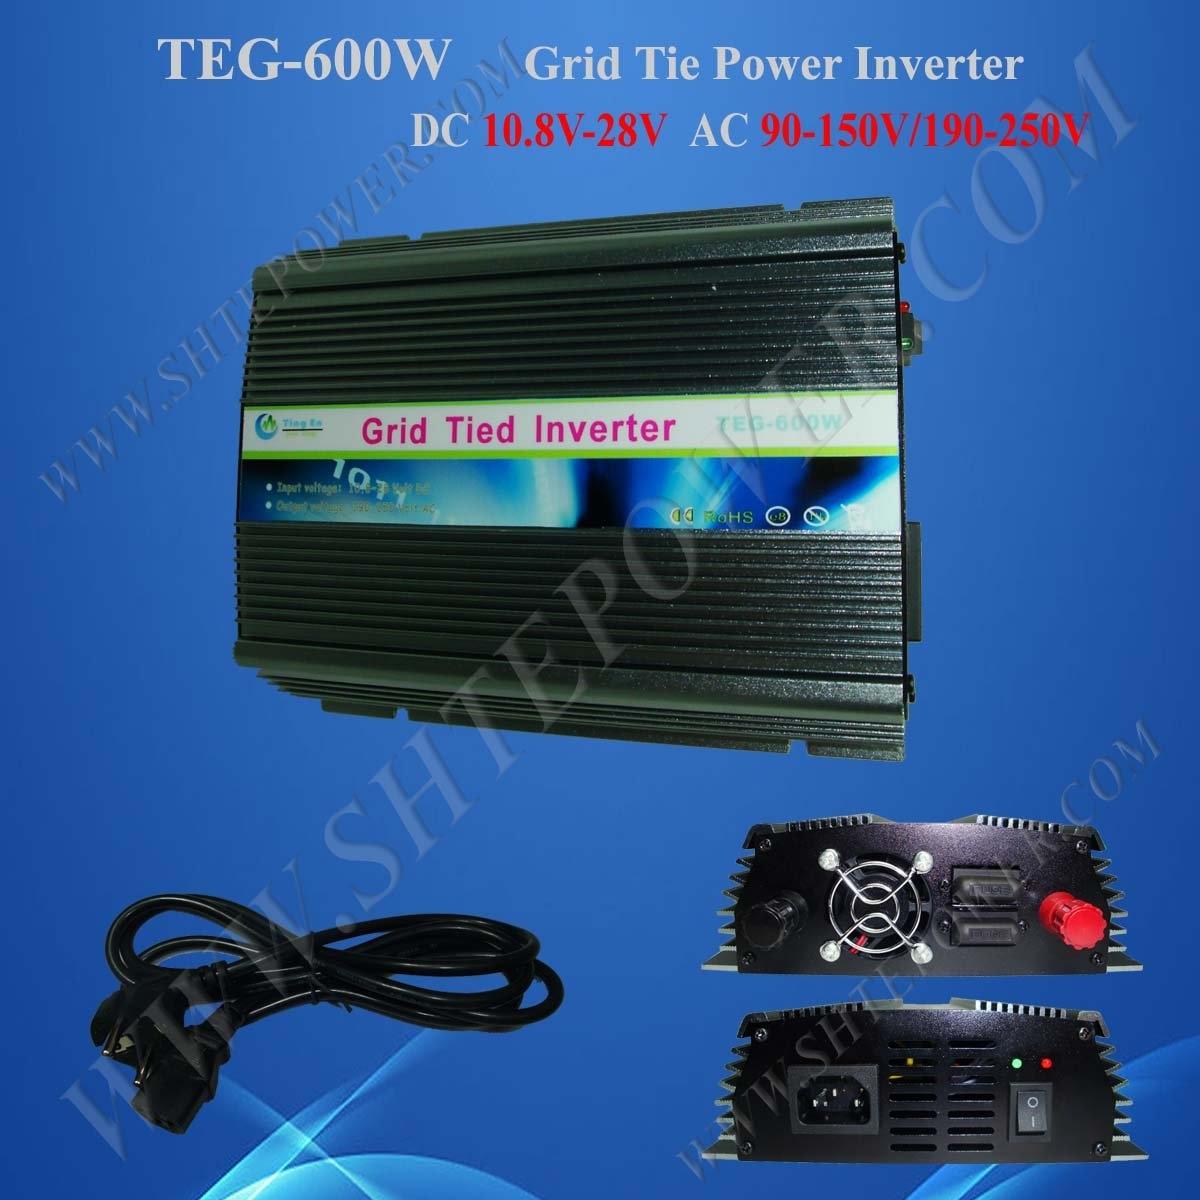 600w grid tie inverter 600 watts tie grid solar inverter dc 10.8-28v to ac 100v inverter solar 600w 20 40vdc mppt grid tie inverter for 600 720w 24v 48cells or 30v 60cells pv solar panel 90 260vac wind power inverter 600w